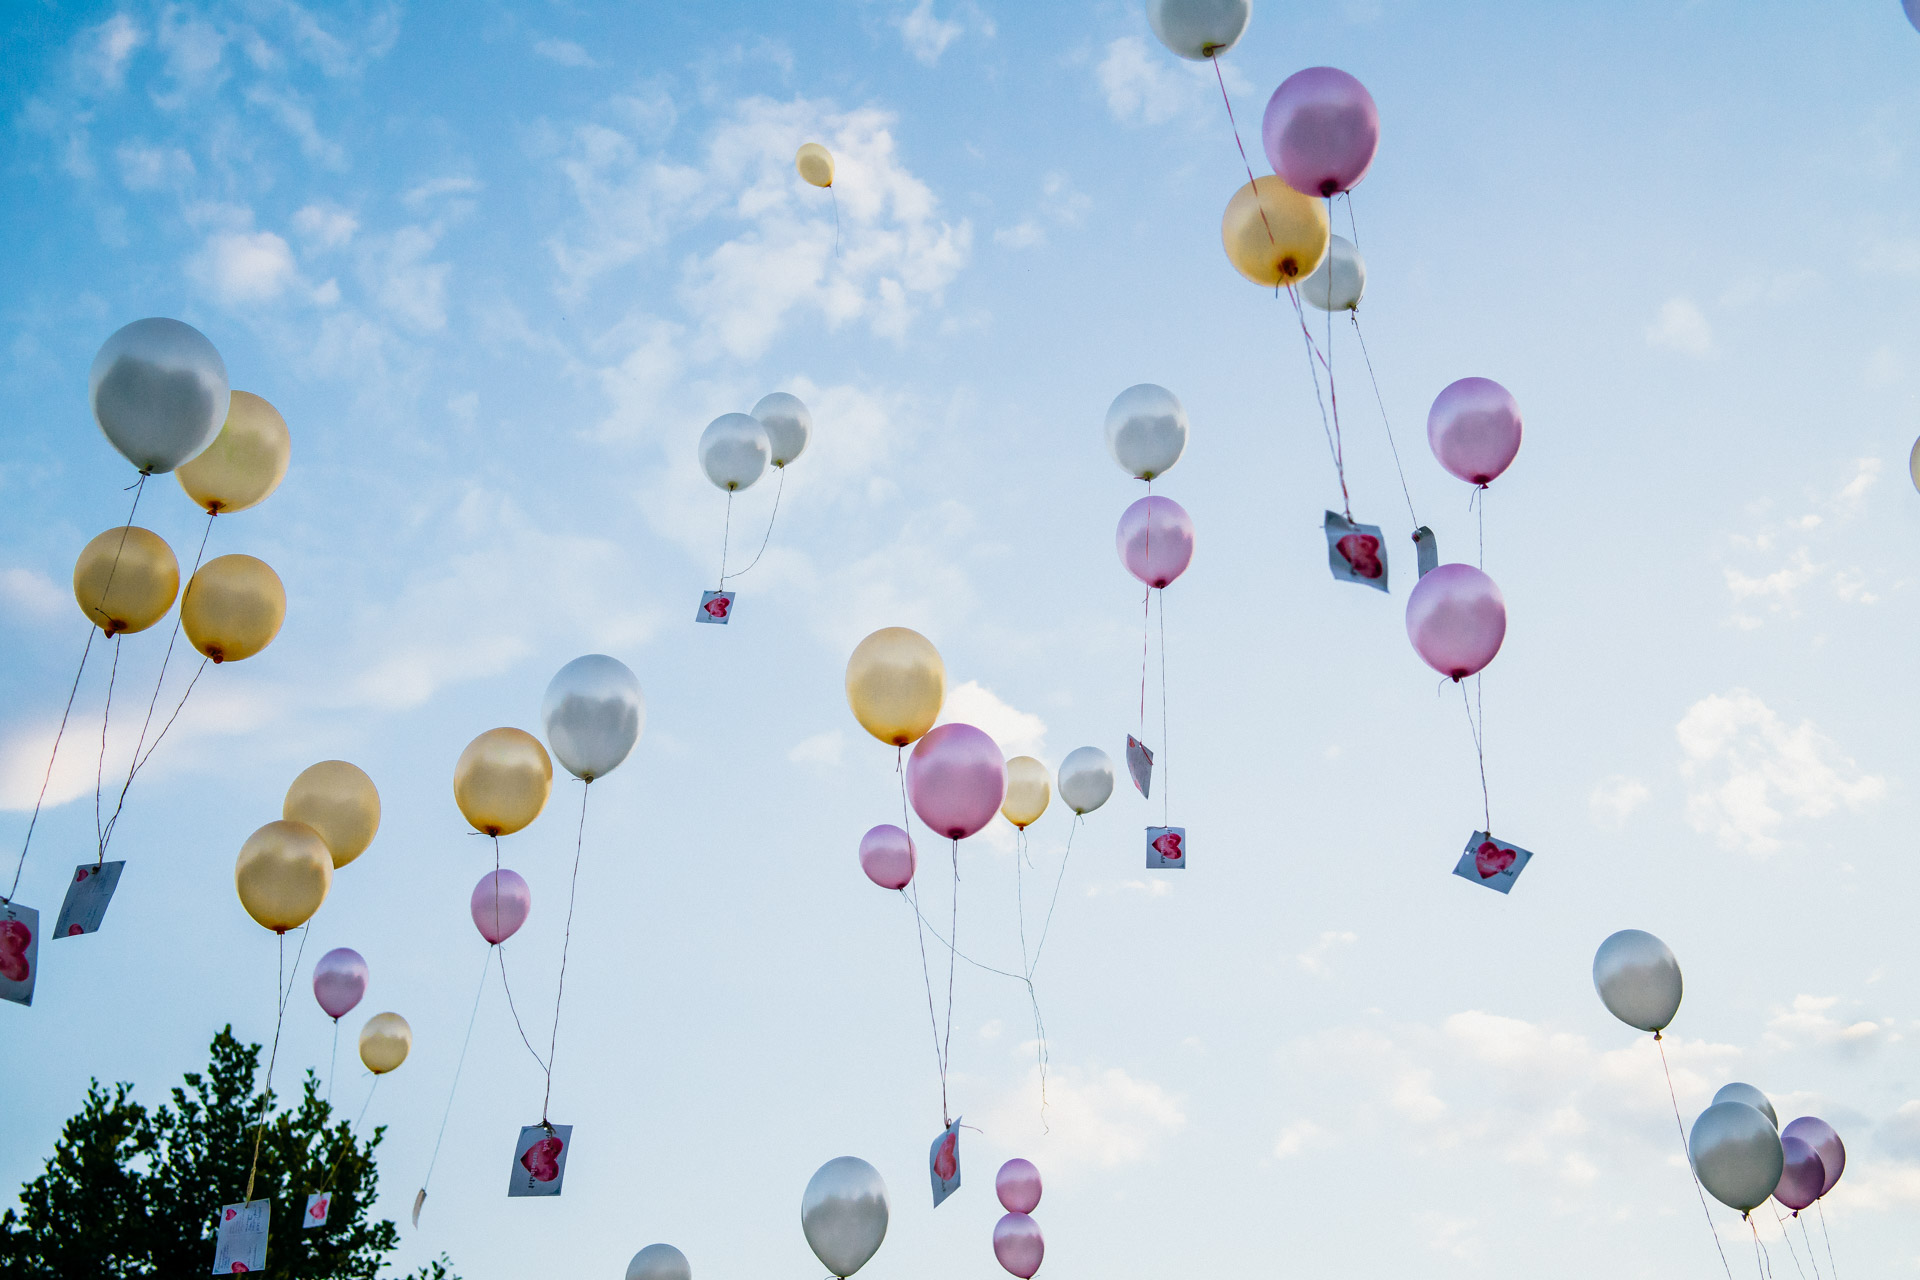 Luftballons Langselbold Main-Kinzig-Kreis